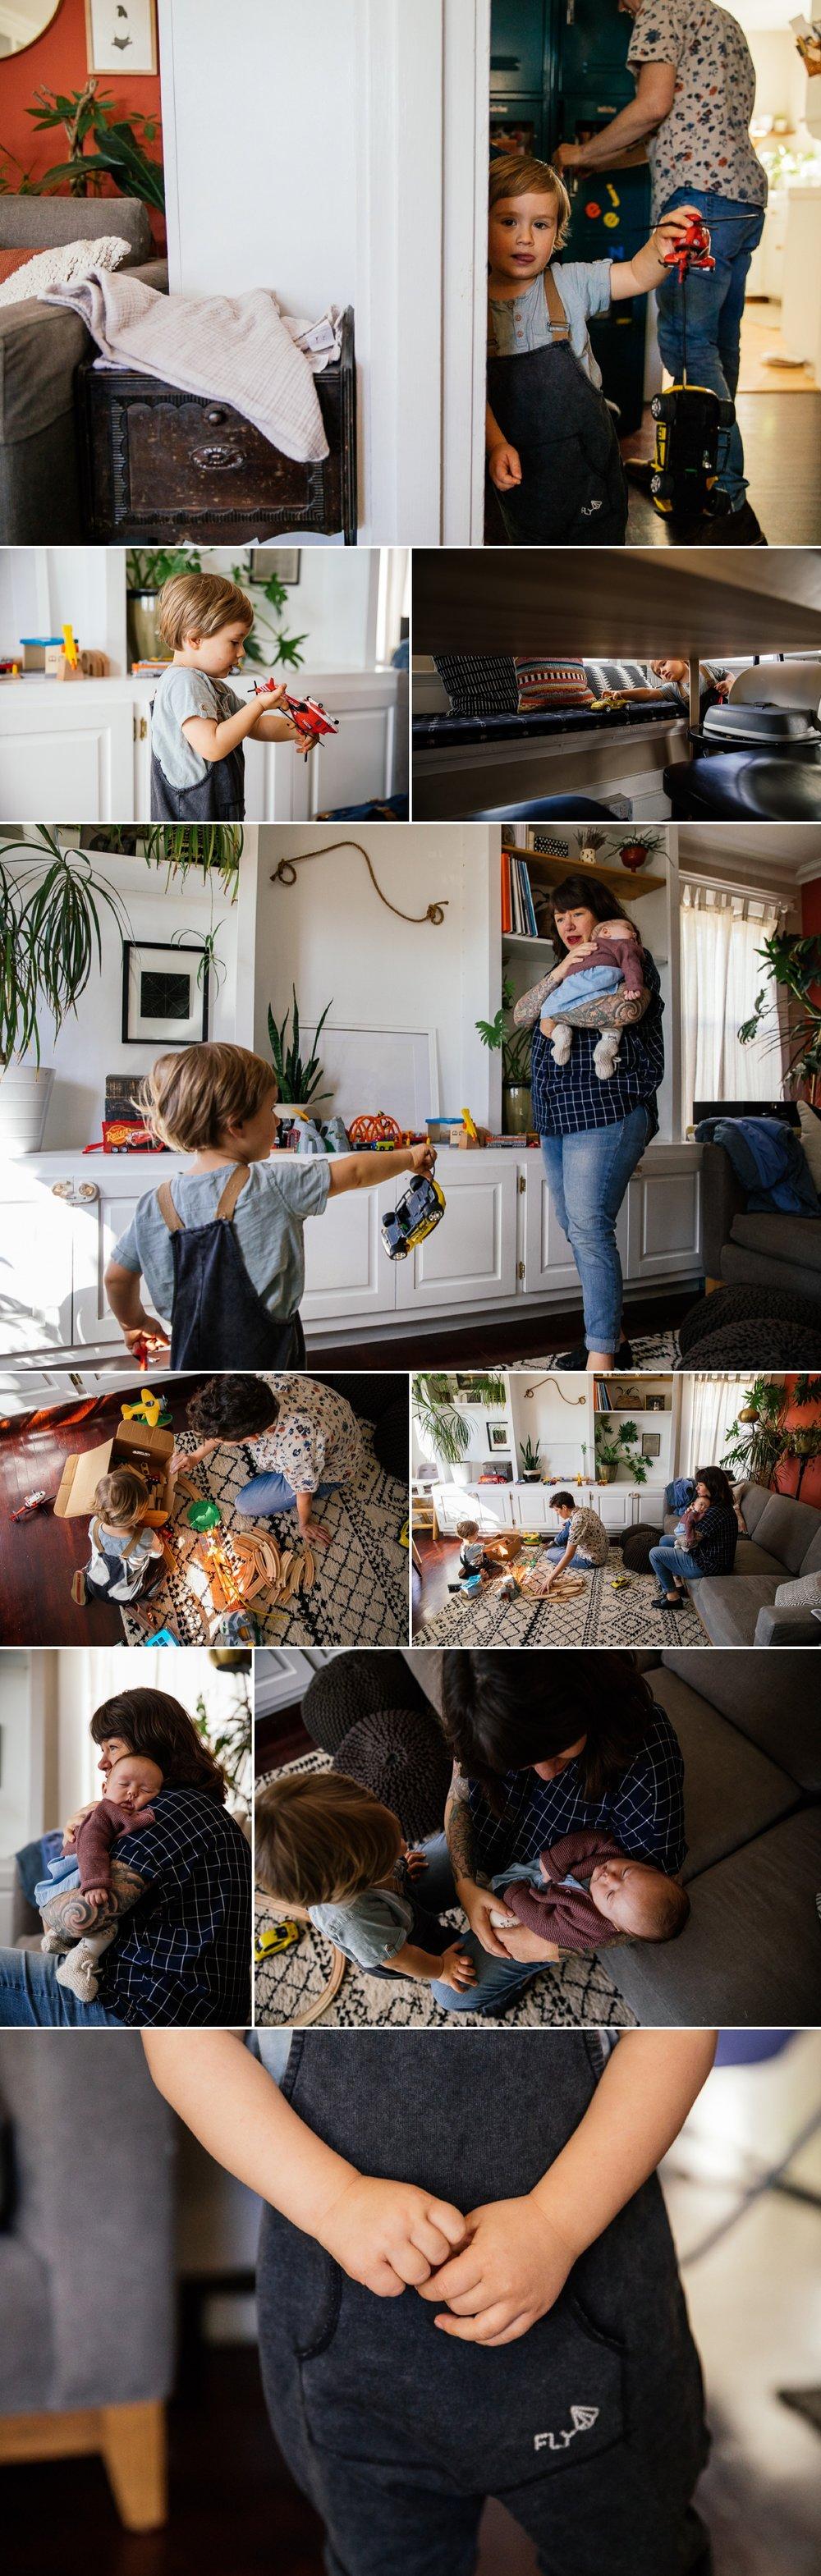 berkeley family photographer.jpg